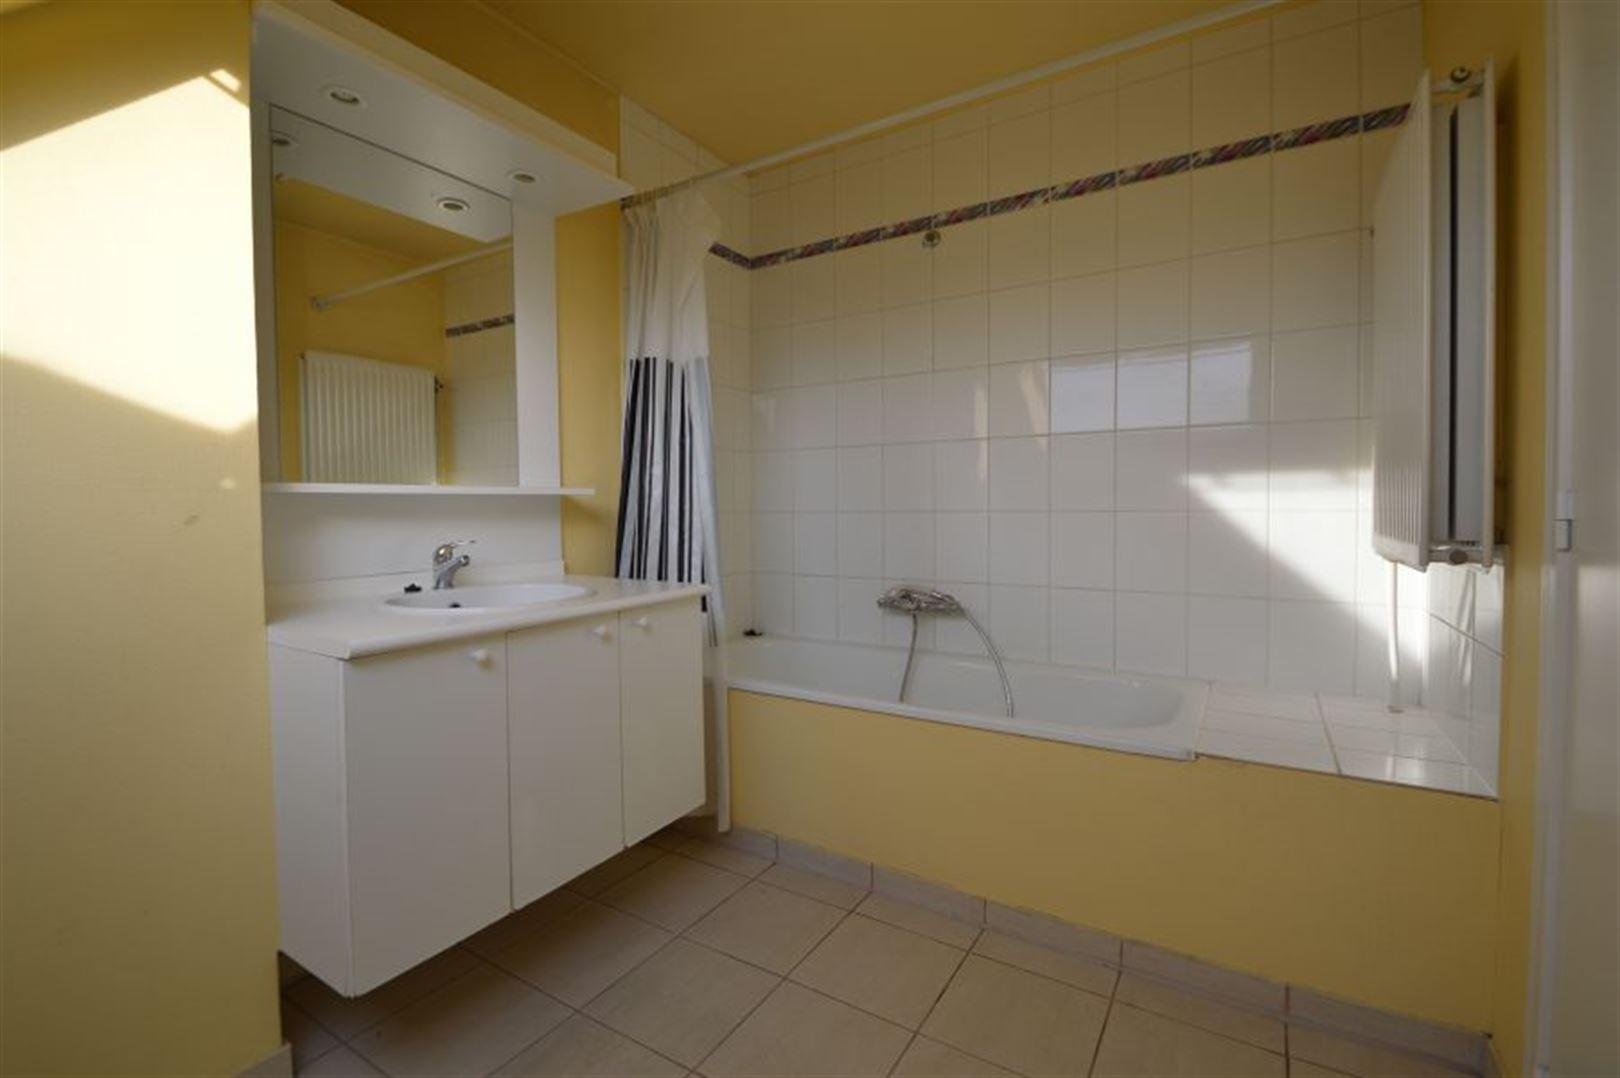 Foto 6 : Duplex/Penthouse te 9200 Baasrode (België) - Prijs € 585